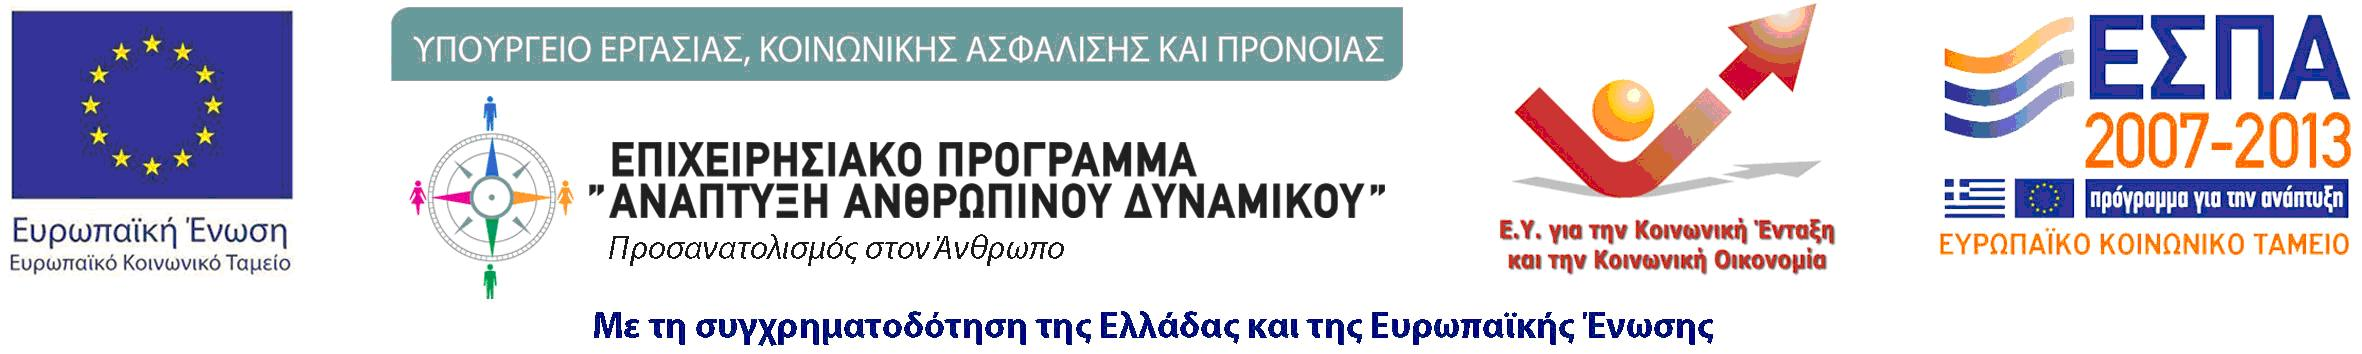 http://www.anko-eunet.gr/uploads/assets//Logos/TOPEKO/TOPEKO.JPG